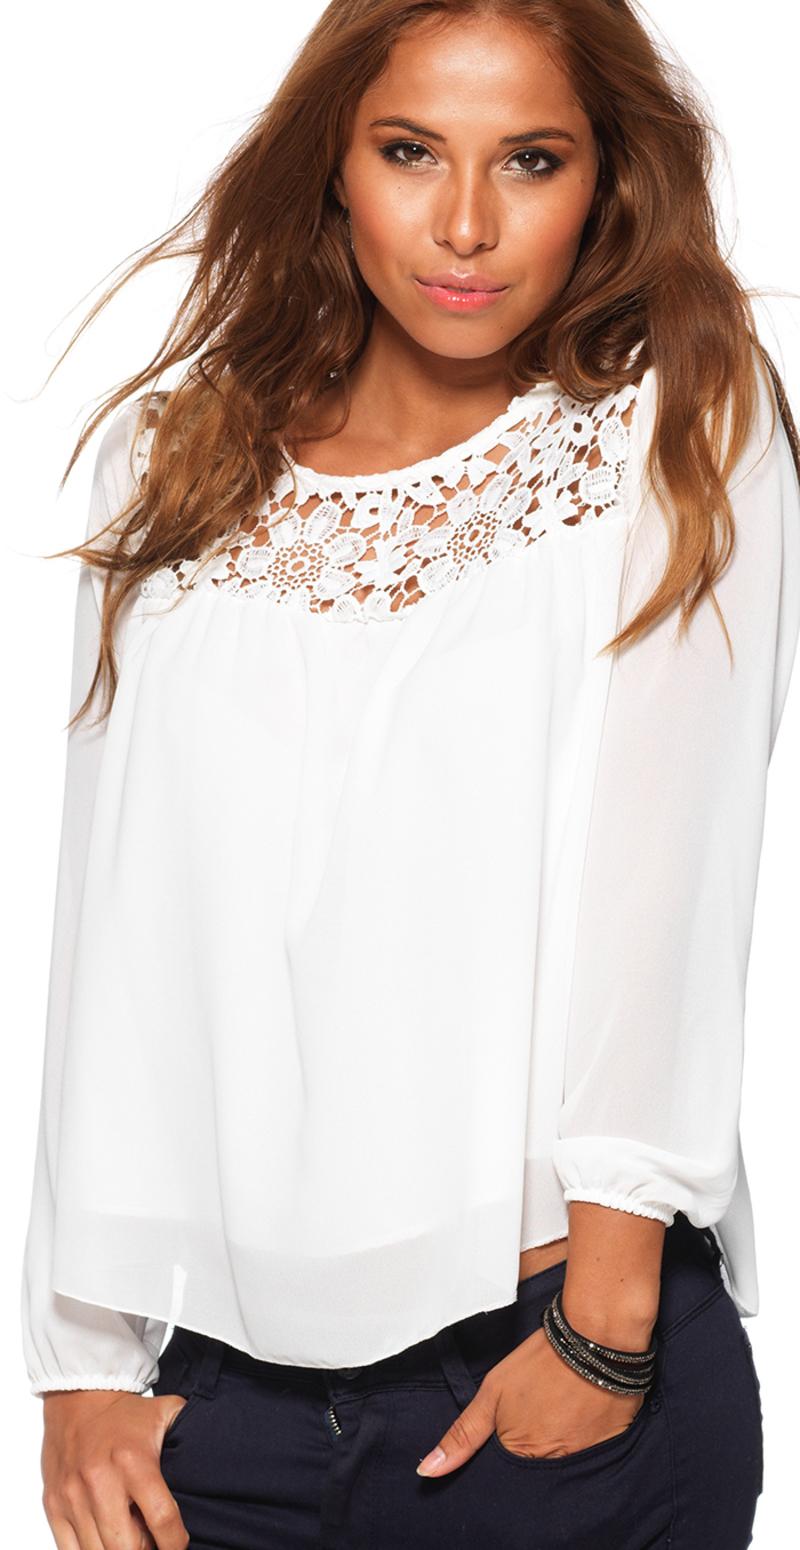 hvid skjorte med blonder